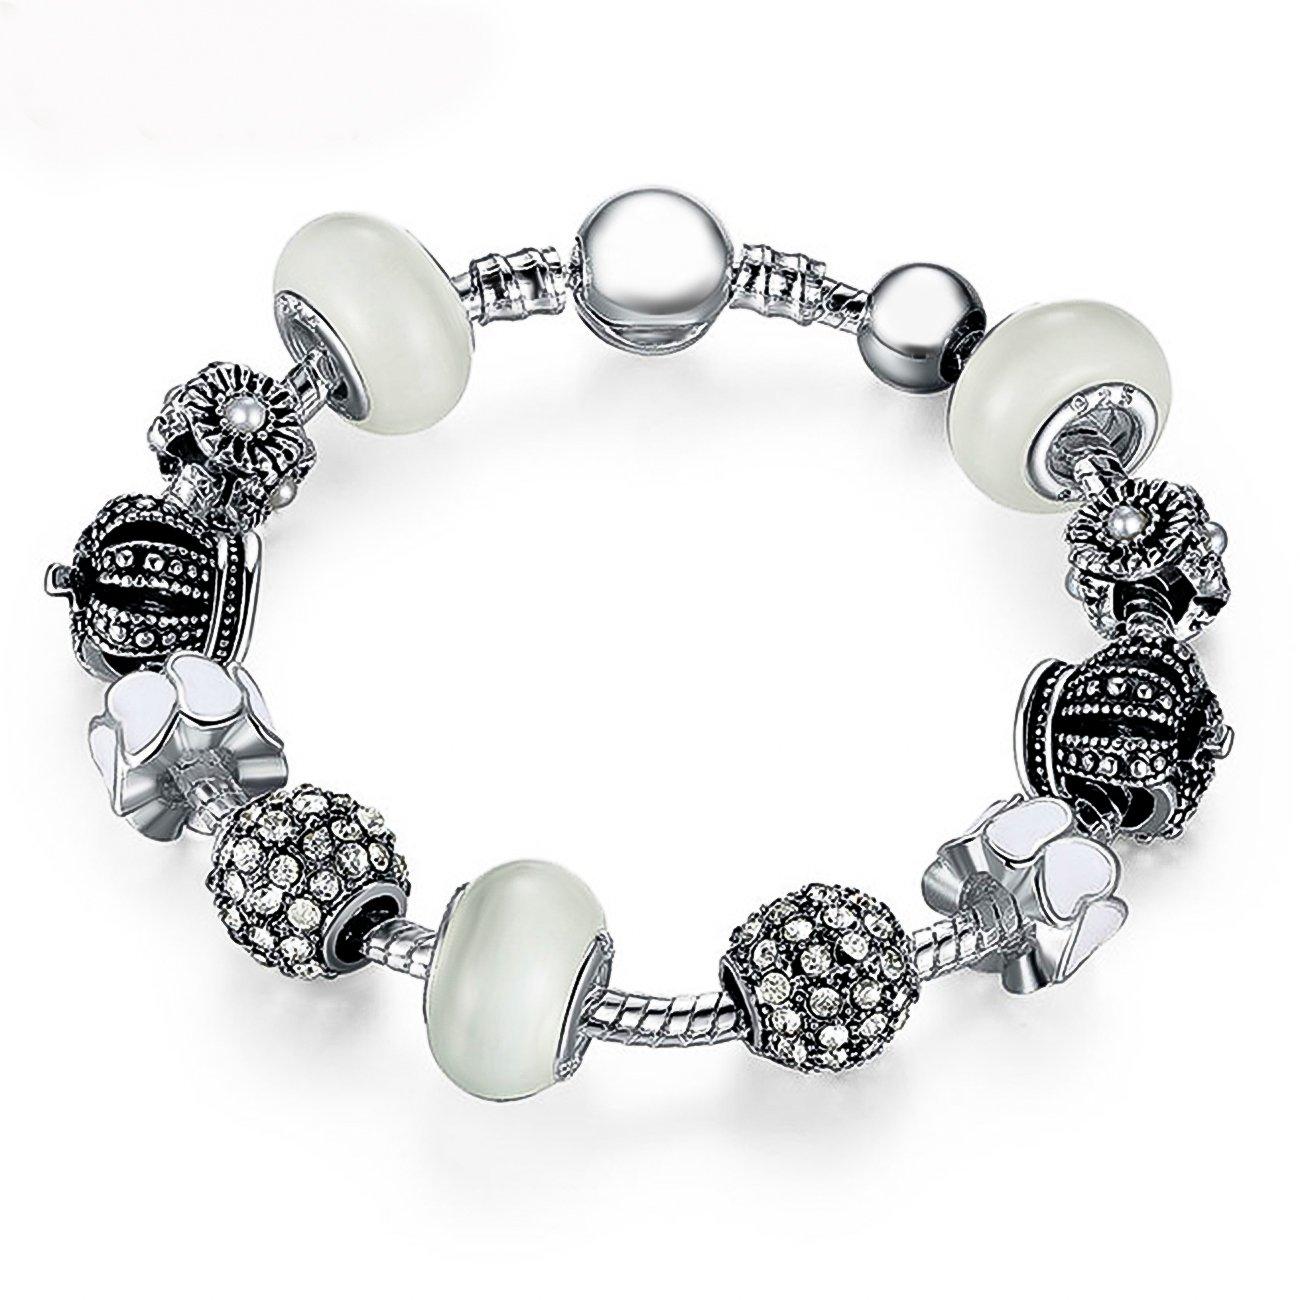 Damen Armband Fatimas Hand Hamsa Schmuck-Armband Glücksbringer Geschenk Autiga®